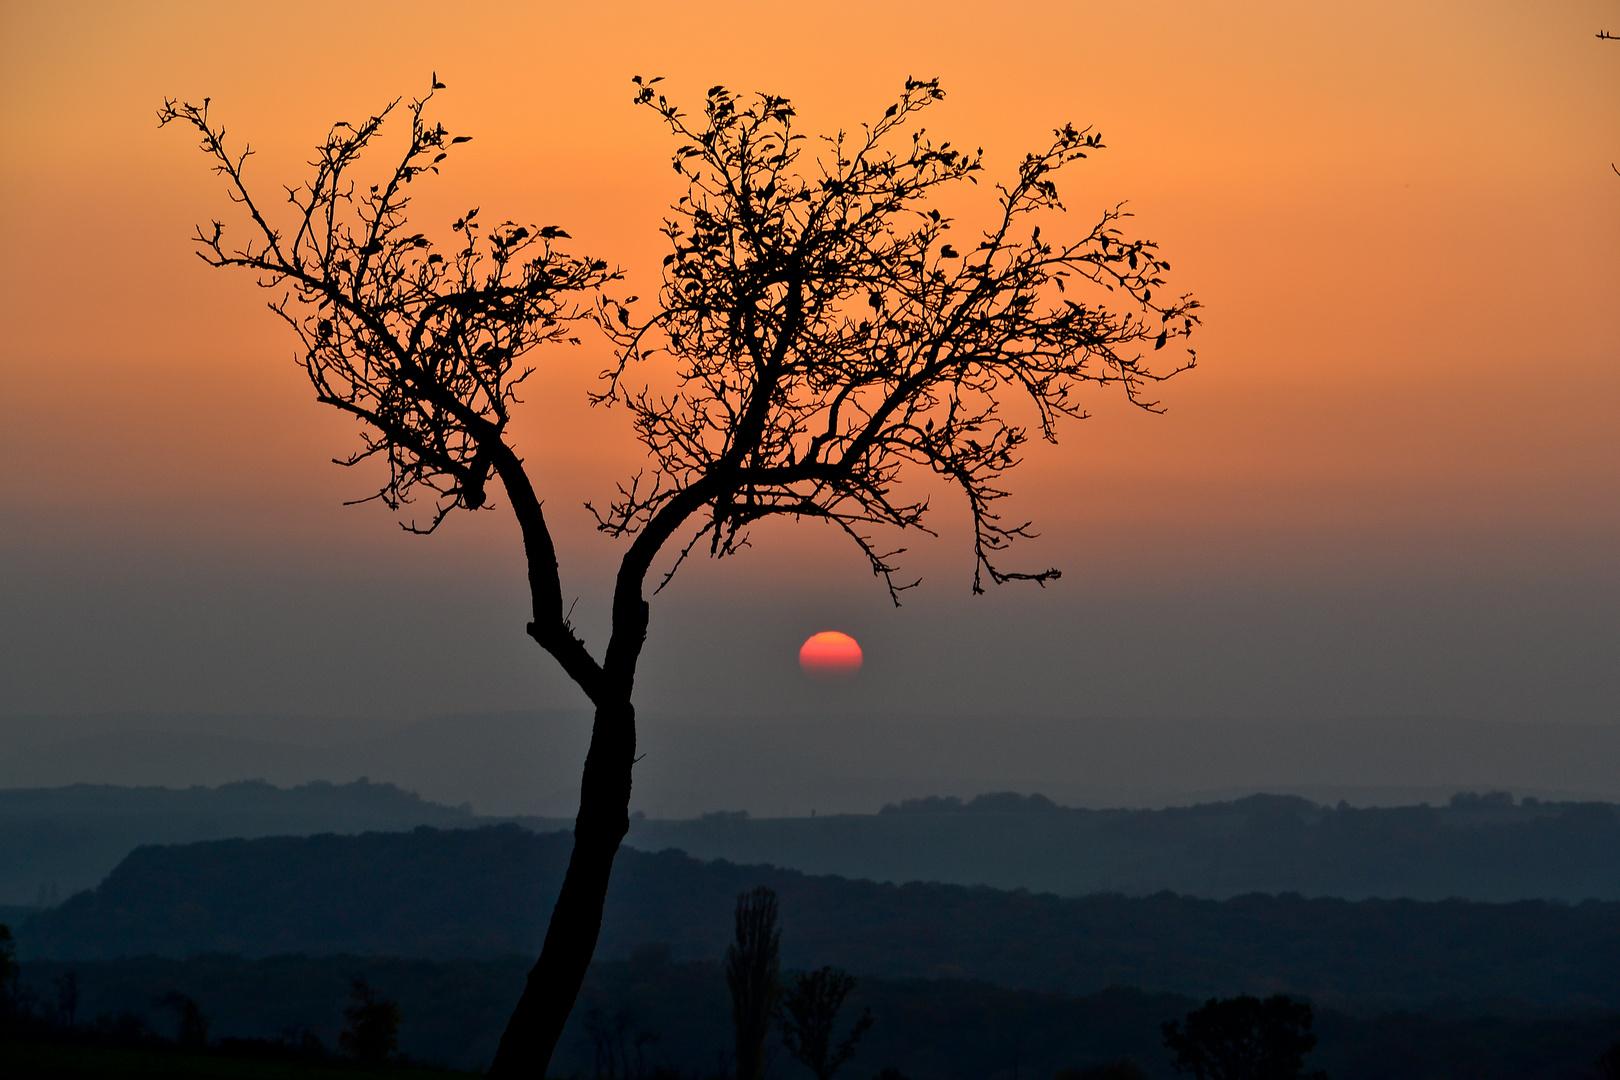 Baum im lothringer Sonnenuntergang